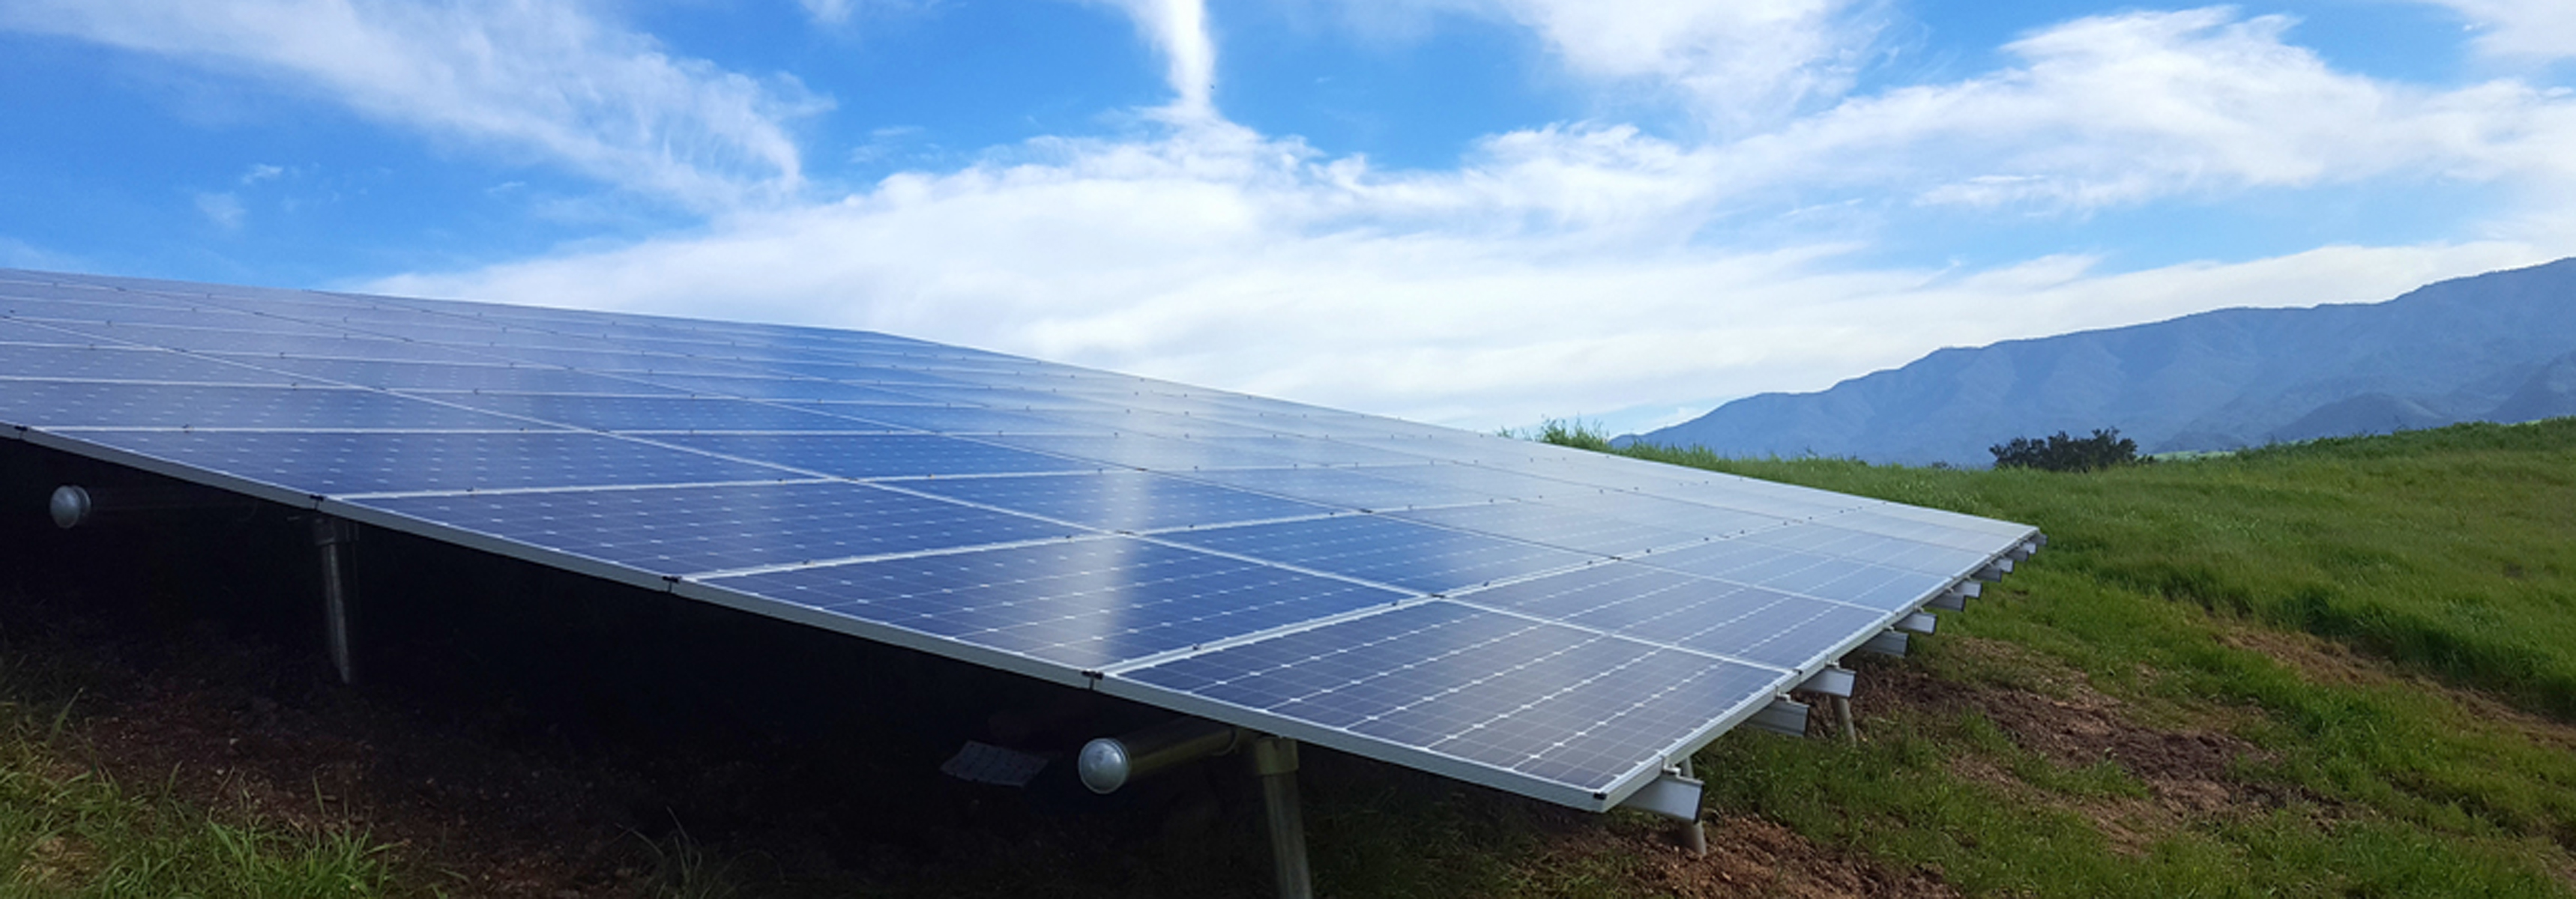 solar ground mount in Nipomo by Solarponics